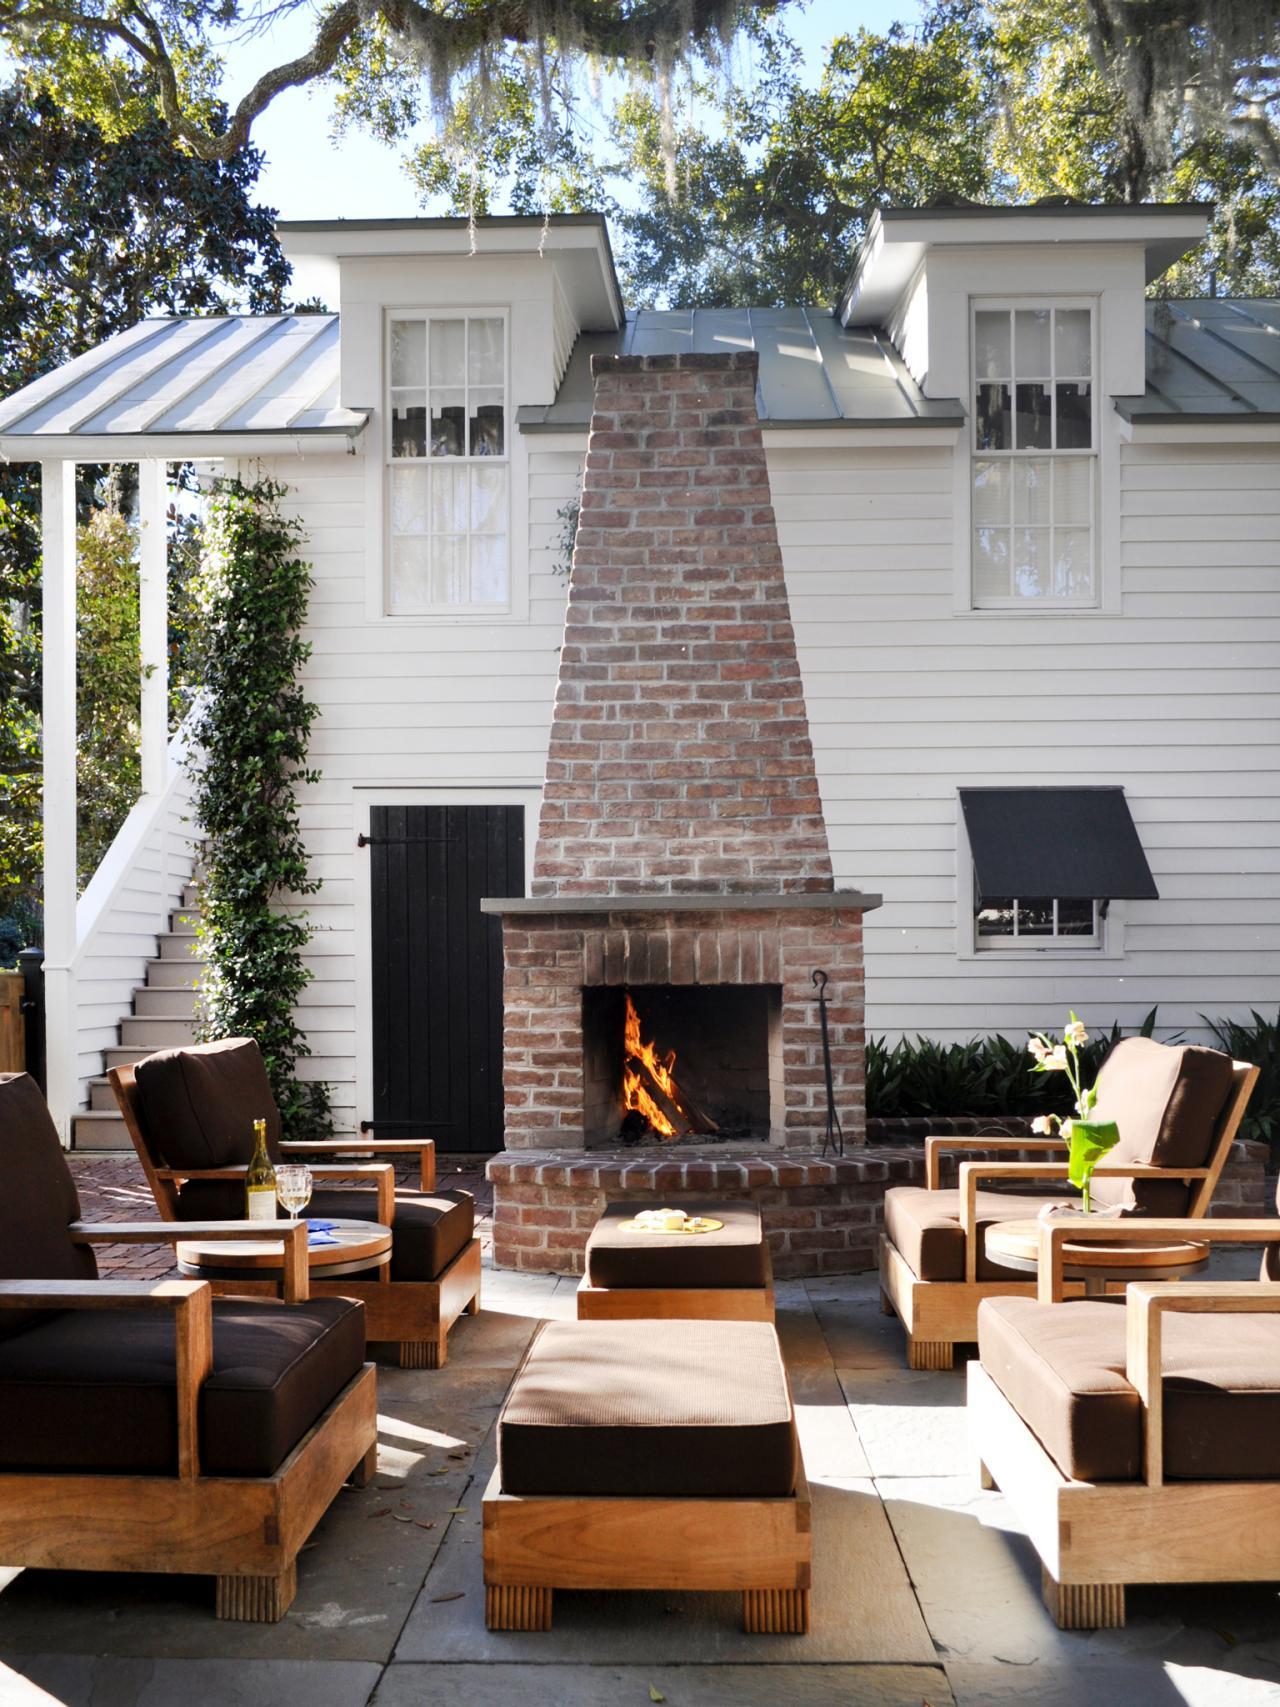 garden design garden design with building outdoor fireplace grill